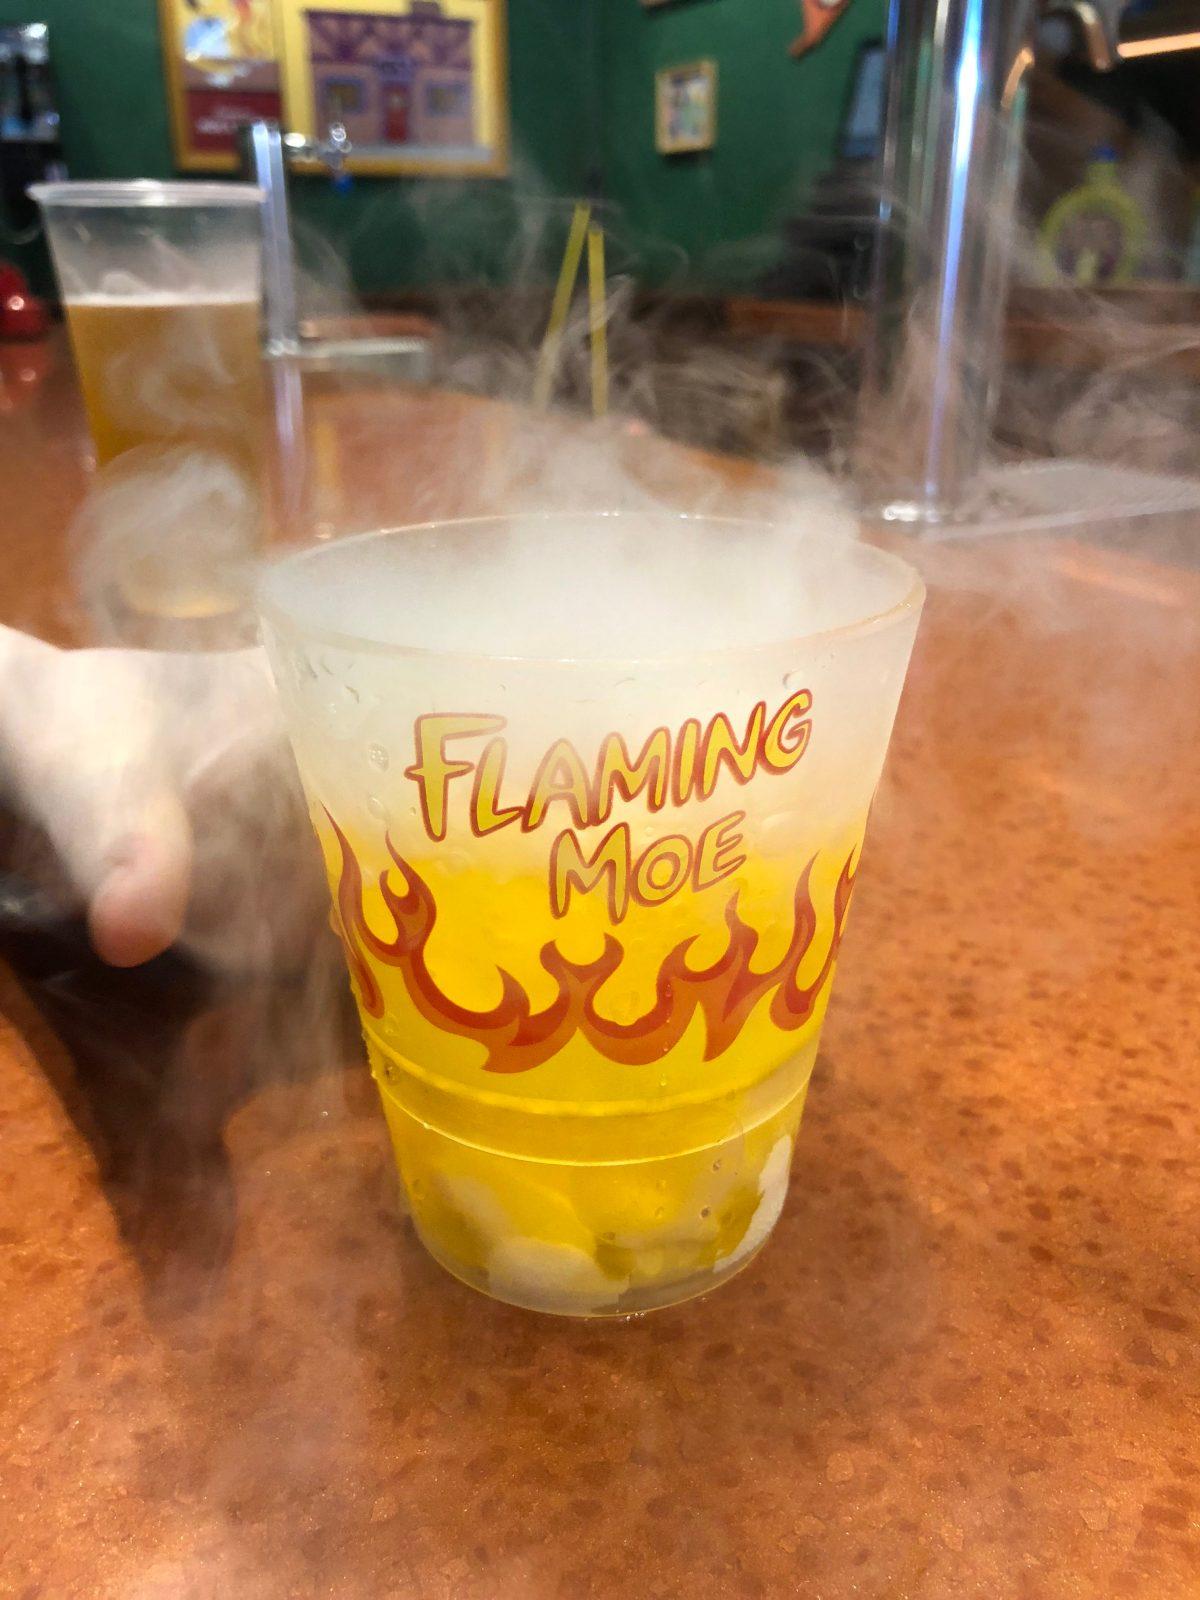 Flaming Moe at Moe's Tavern #flamingmoe #moestavern #universalorlando #whattoeatatuniversal #simpsonsdrink